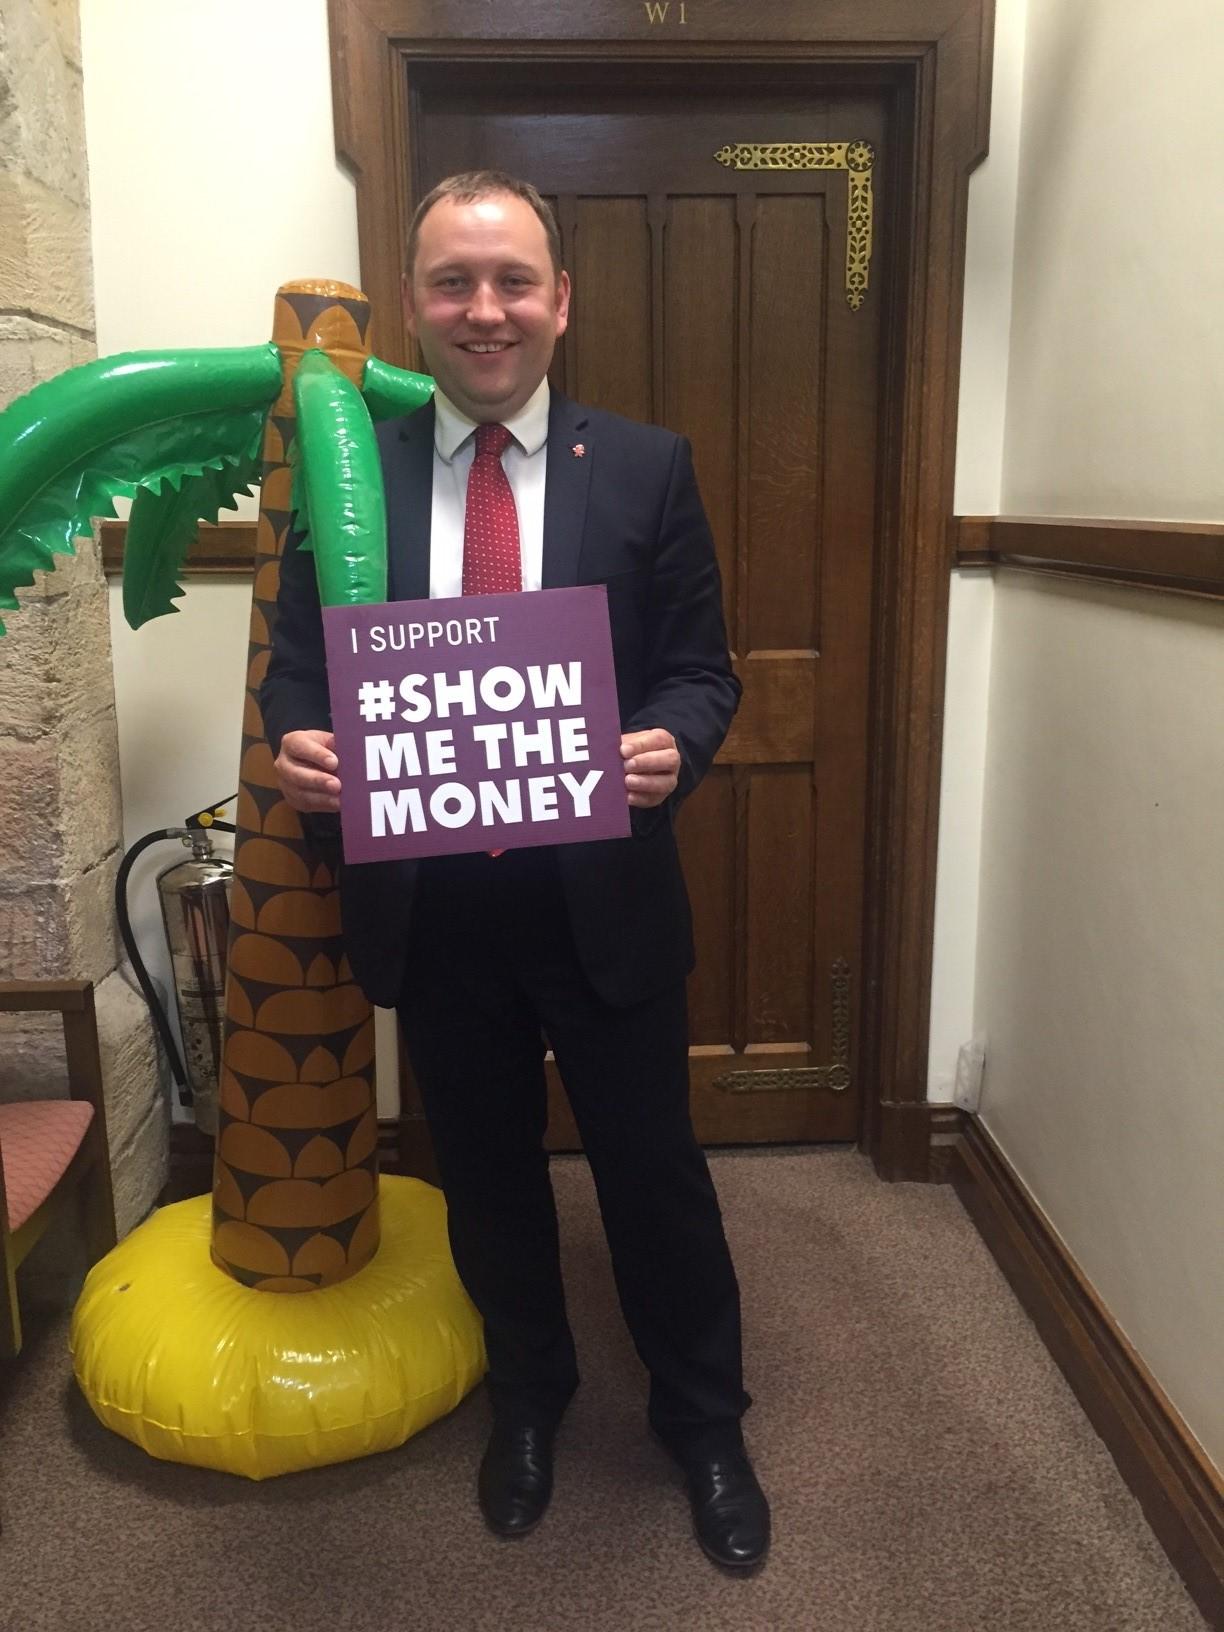 Show_me_the_money.jpg